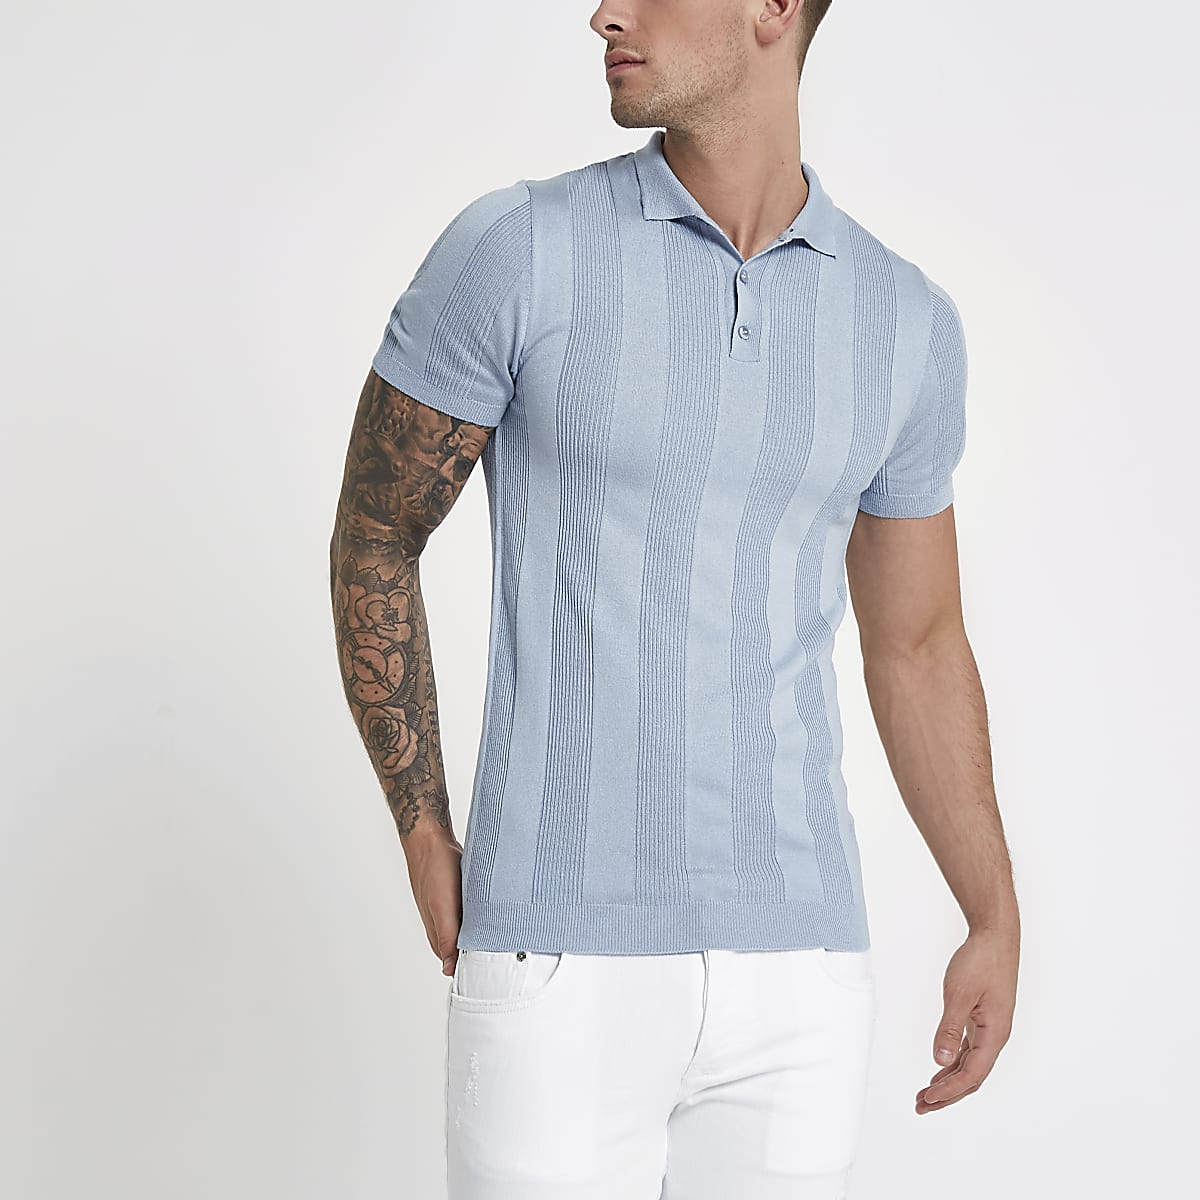 Light blue rib knit muscle fit polo shirt